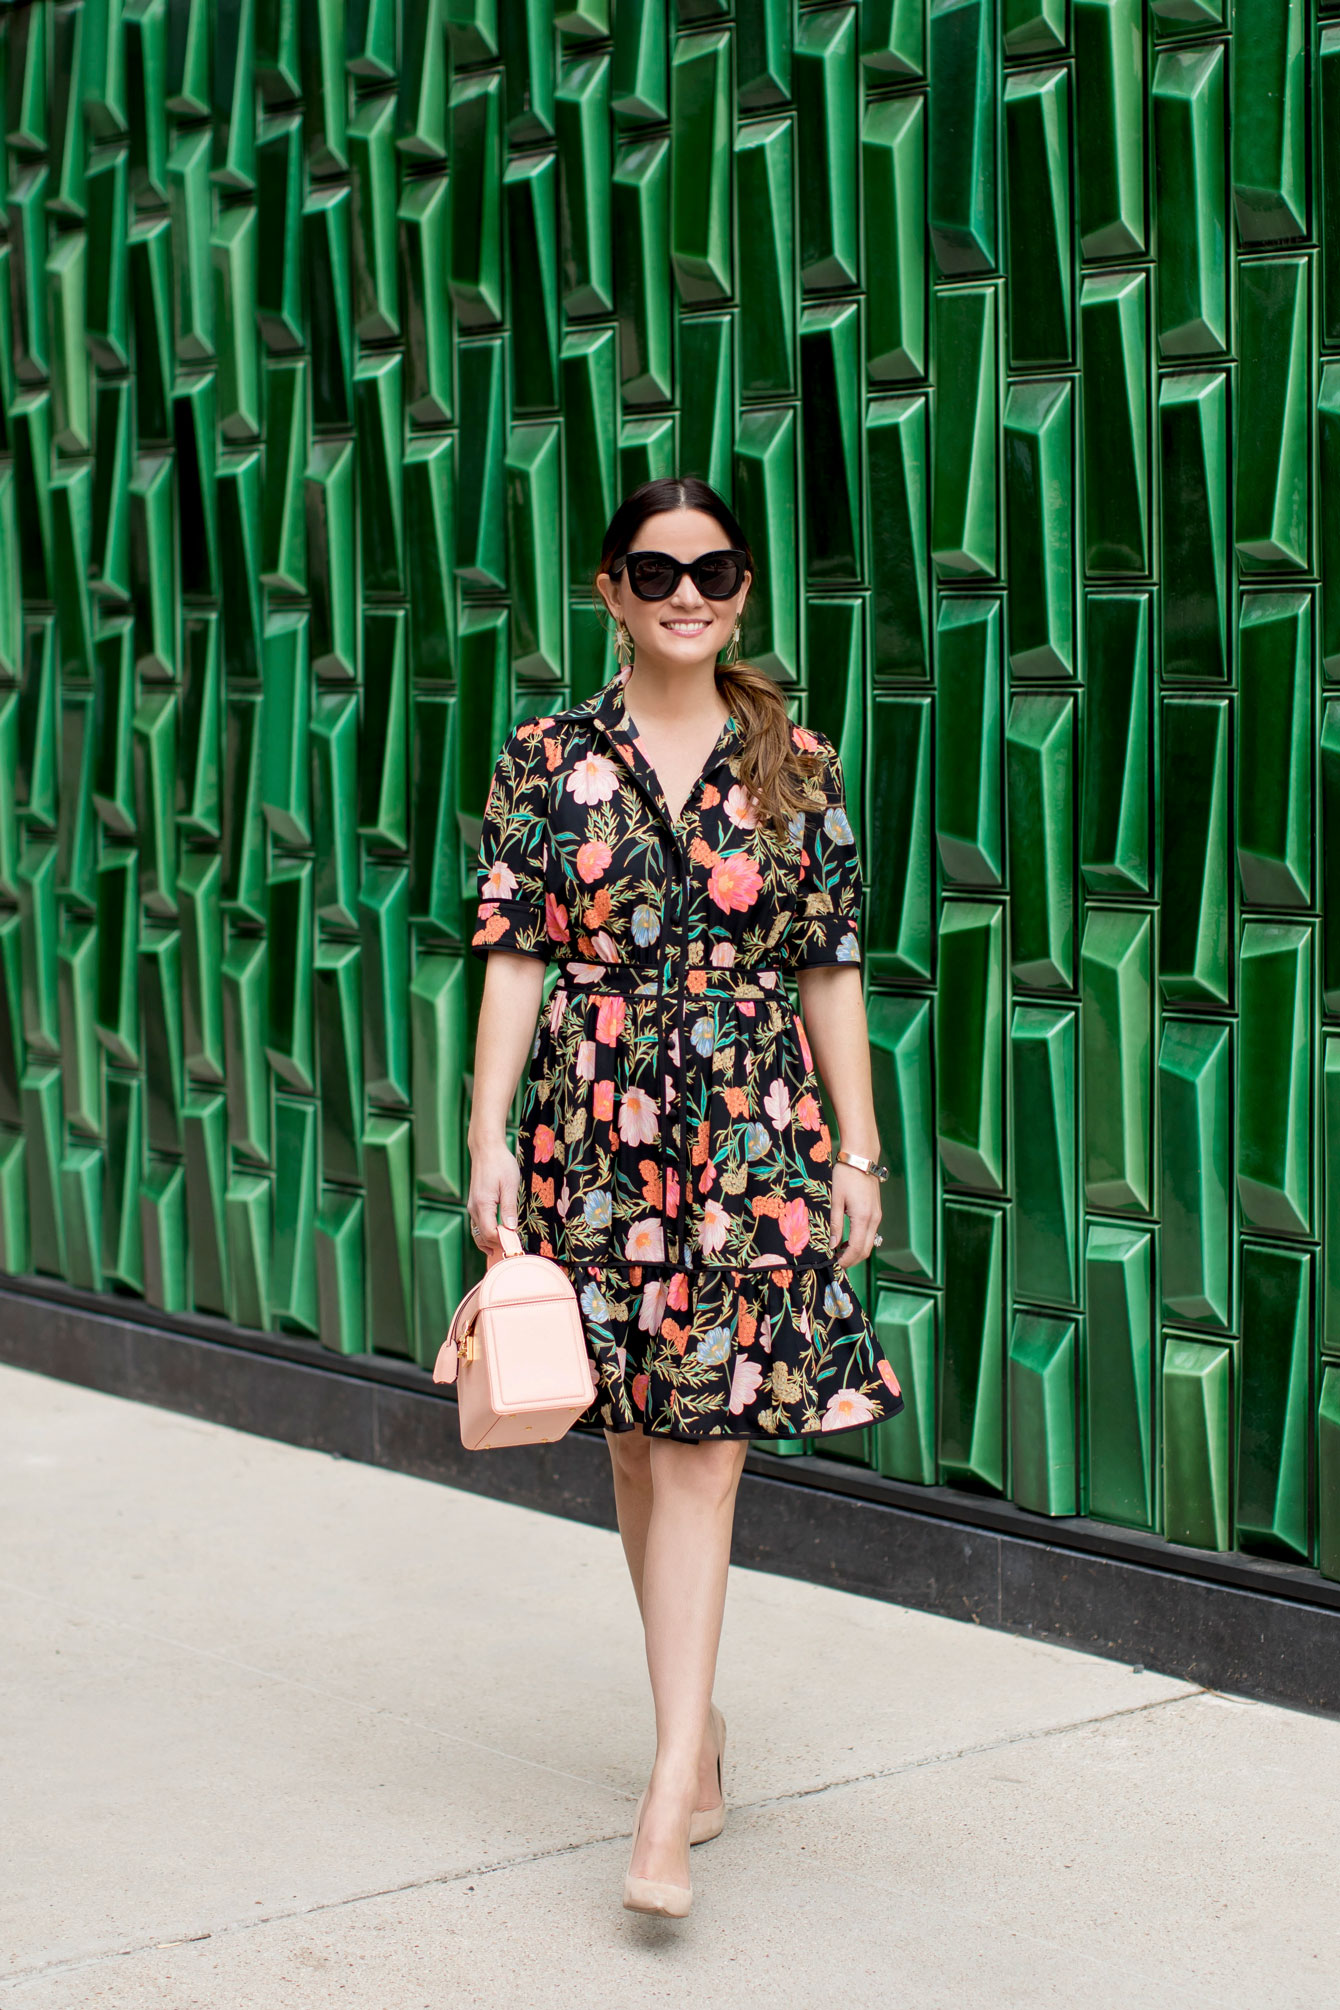 Green Tile Wall Austin